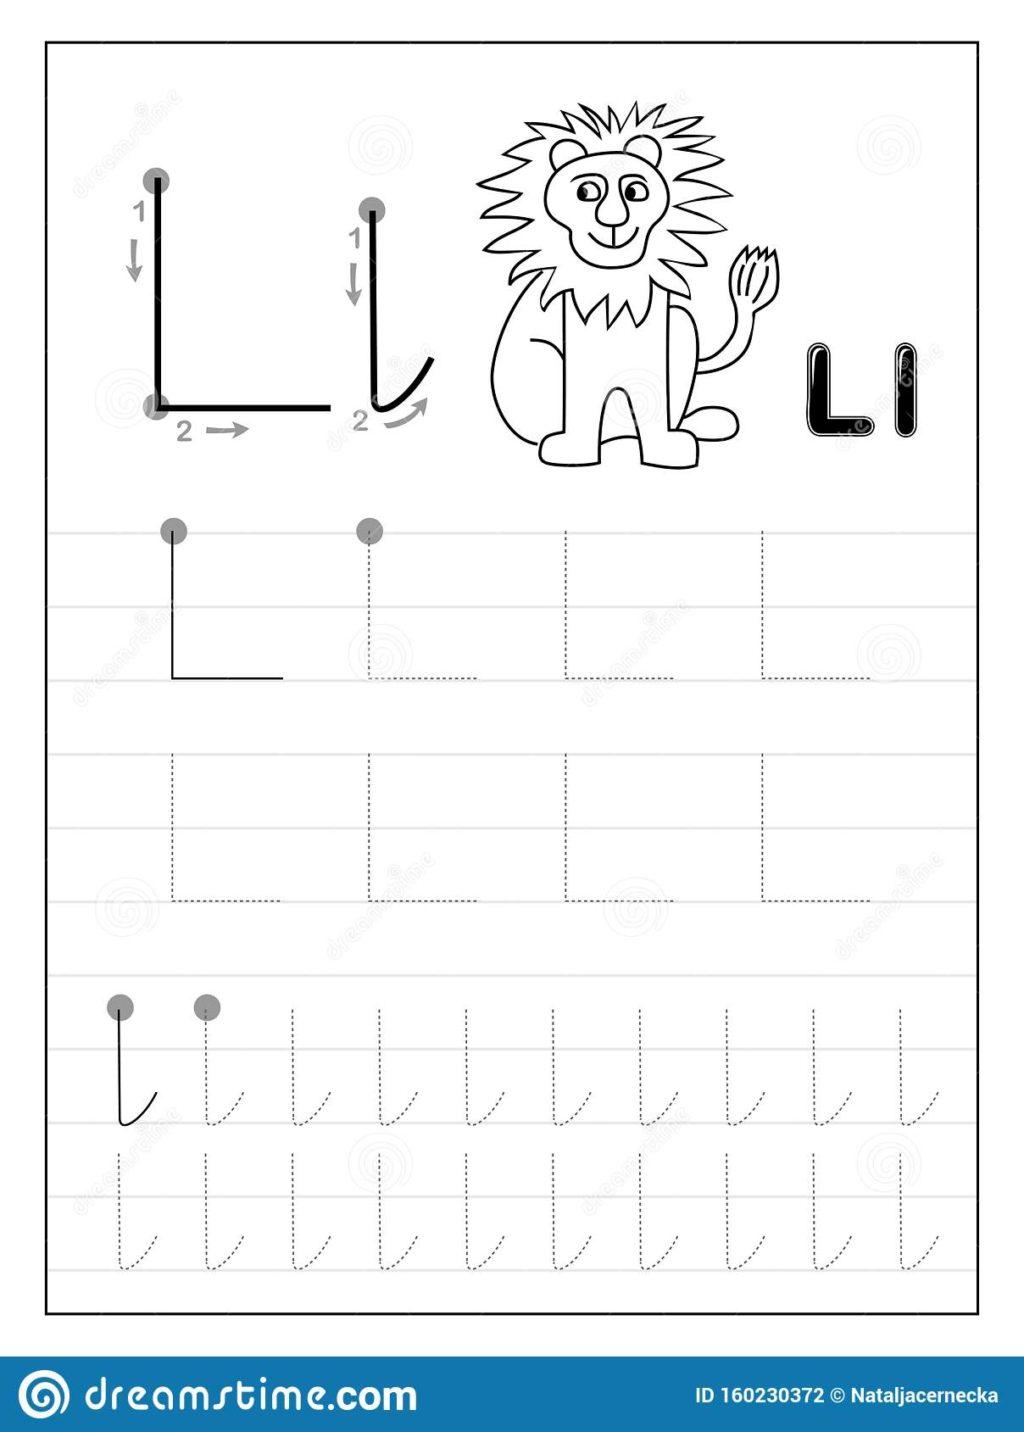 Worksheet ~ Tracing Alphabet Letter L Black And White regarding Letter L Tracing Preschool